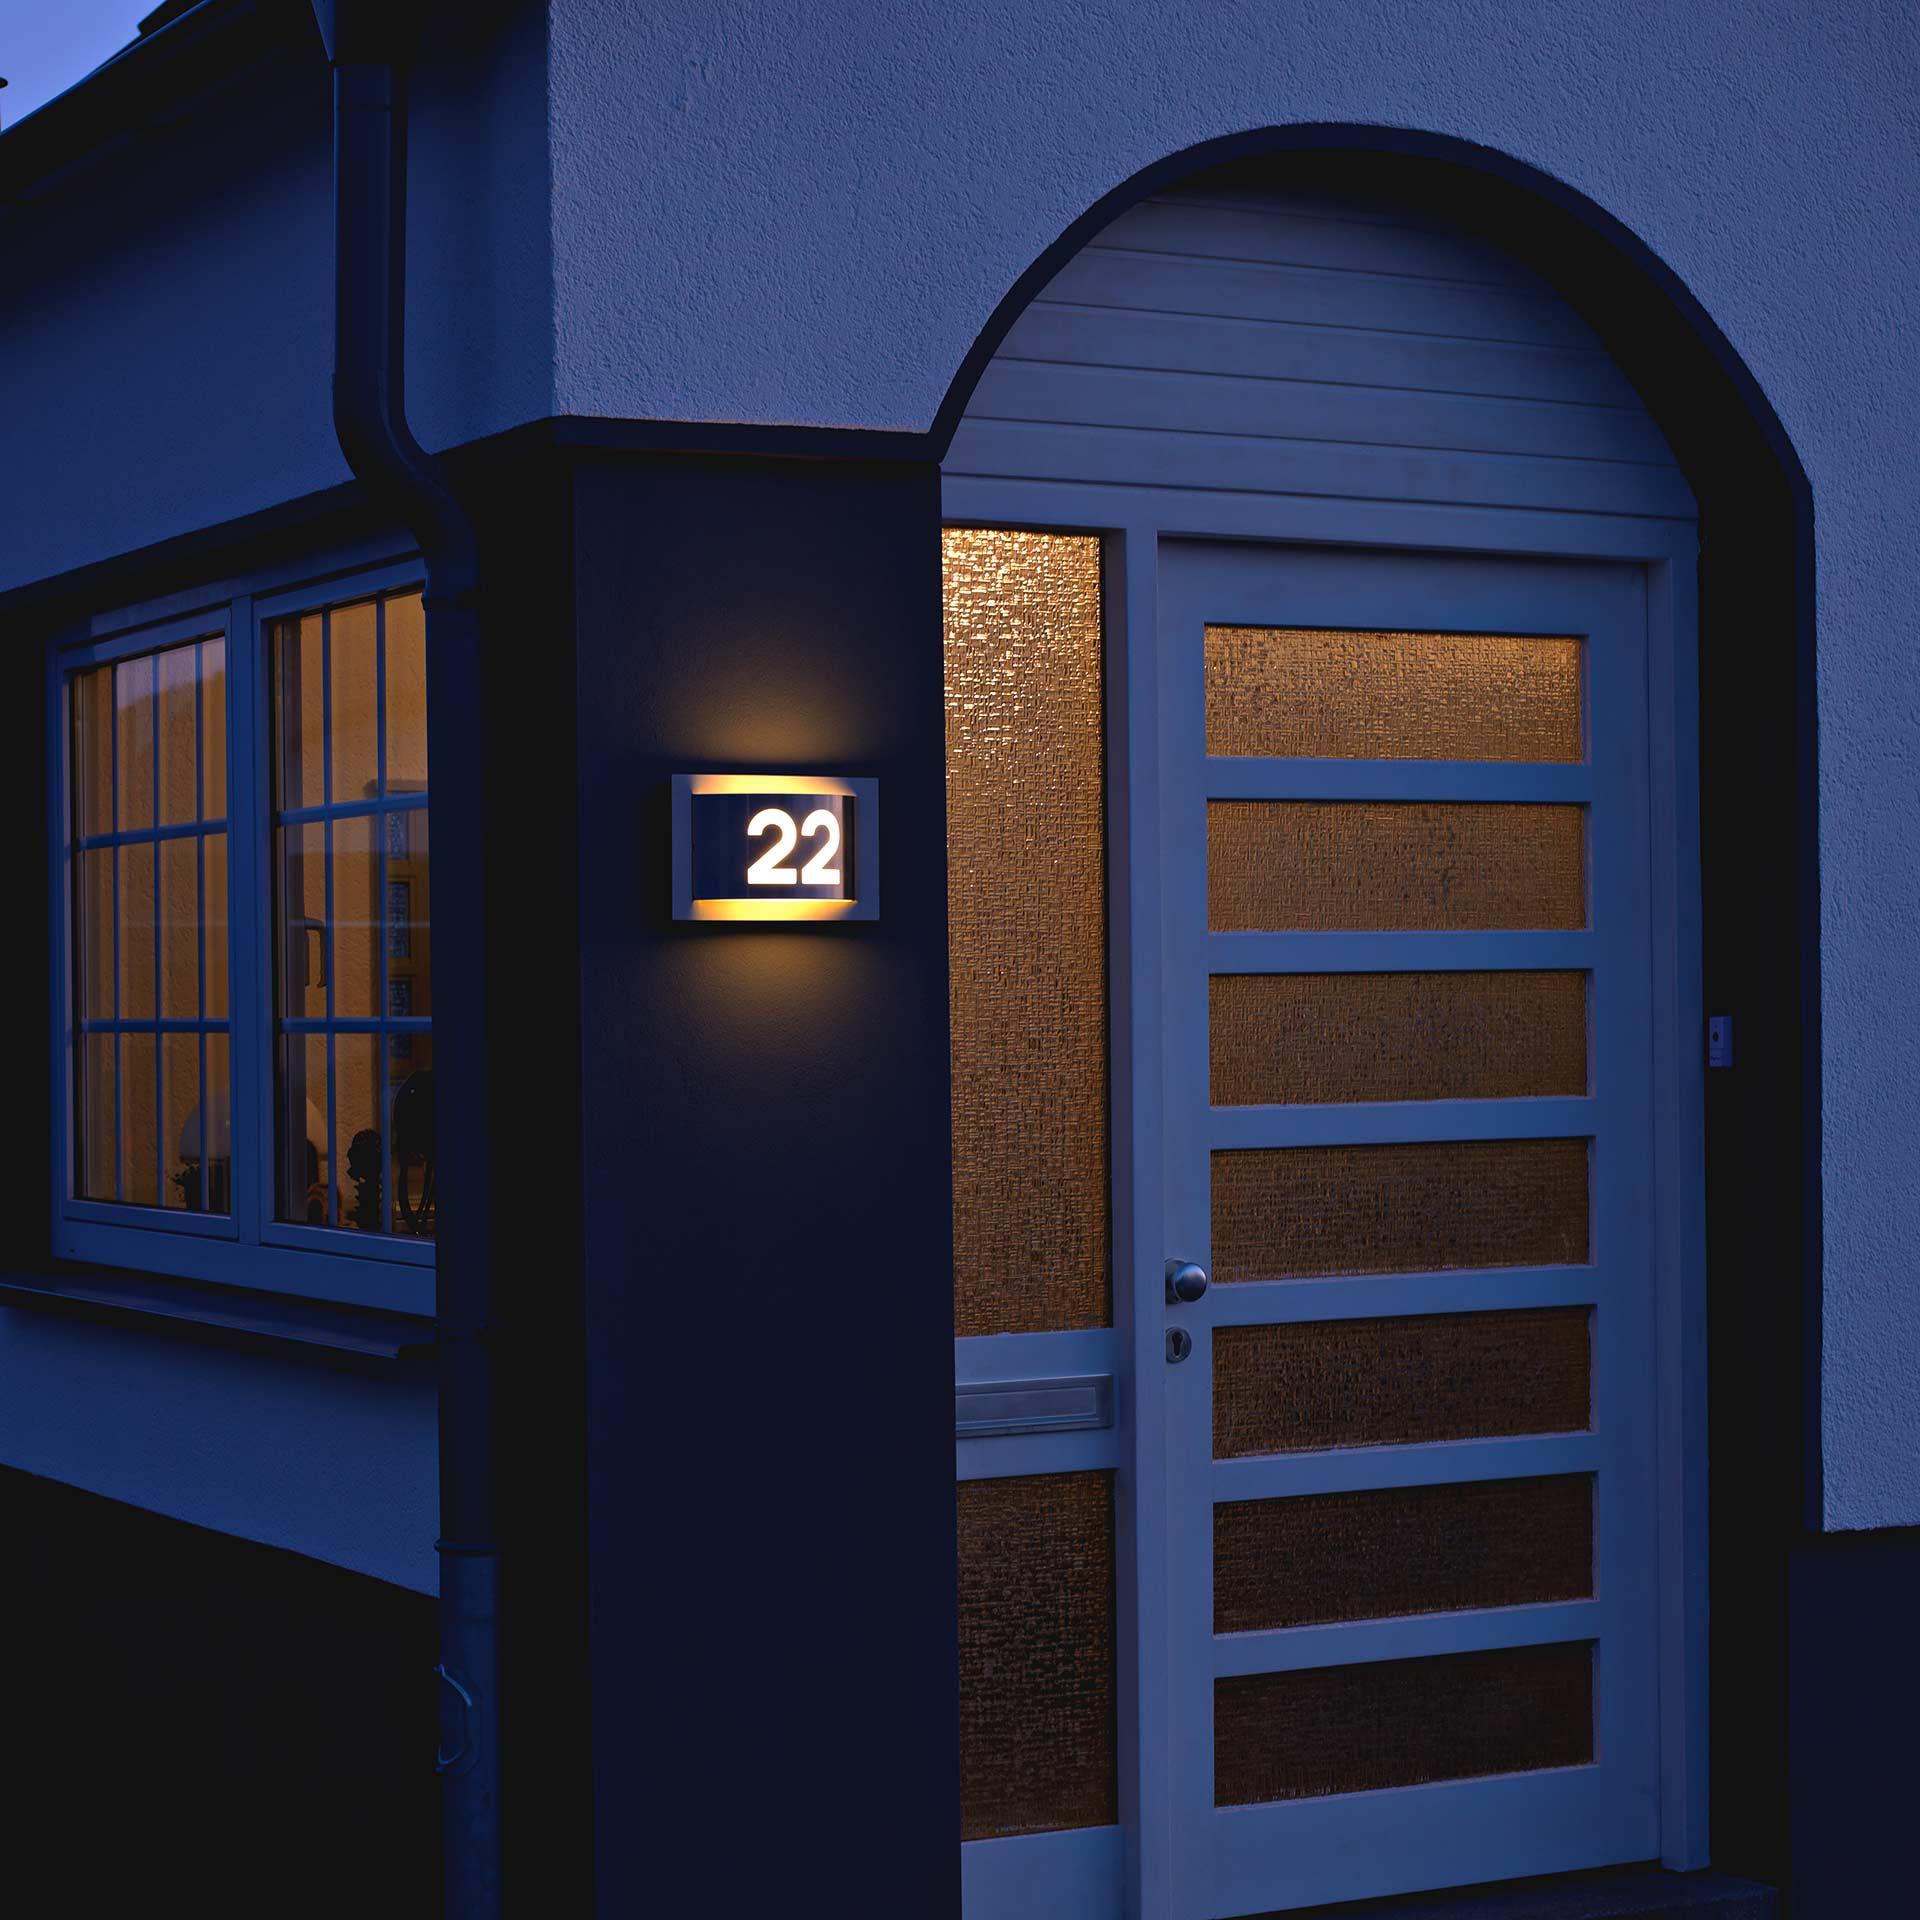 Ein bogenförmiger Hauseingang inklusive Wandbeleuchtung